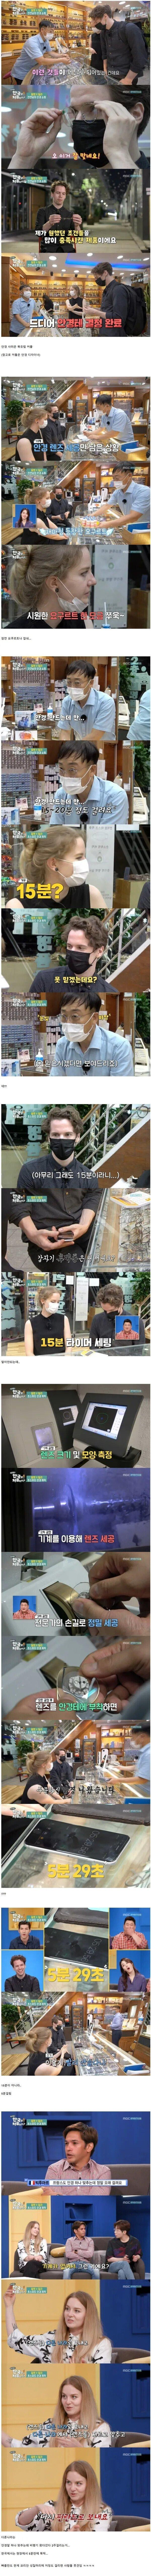 174c8157cfe11b4bc.jpg 외국인들이 놀란 한국의 기술력 중 하나